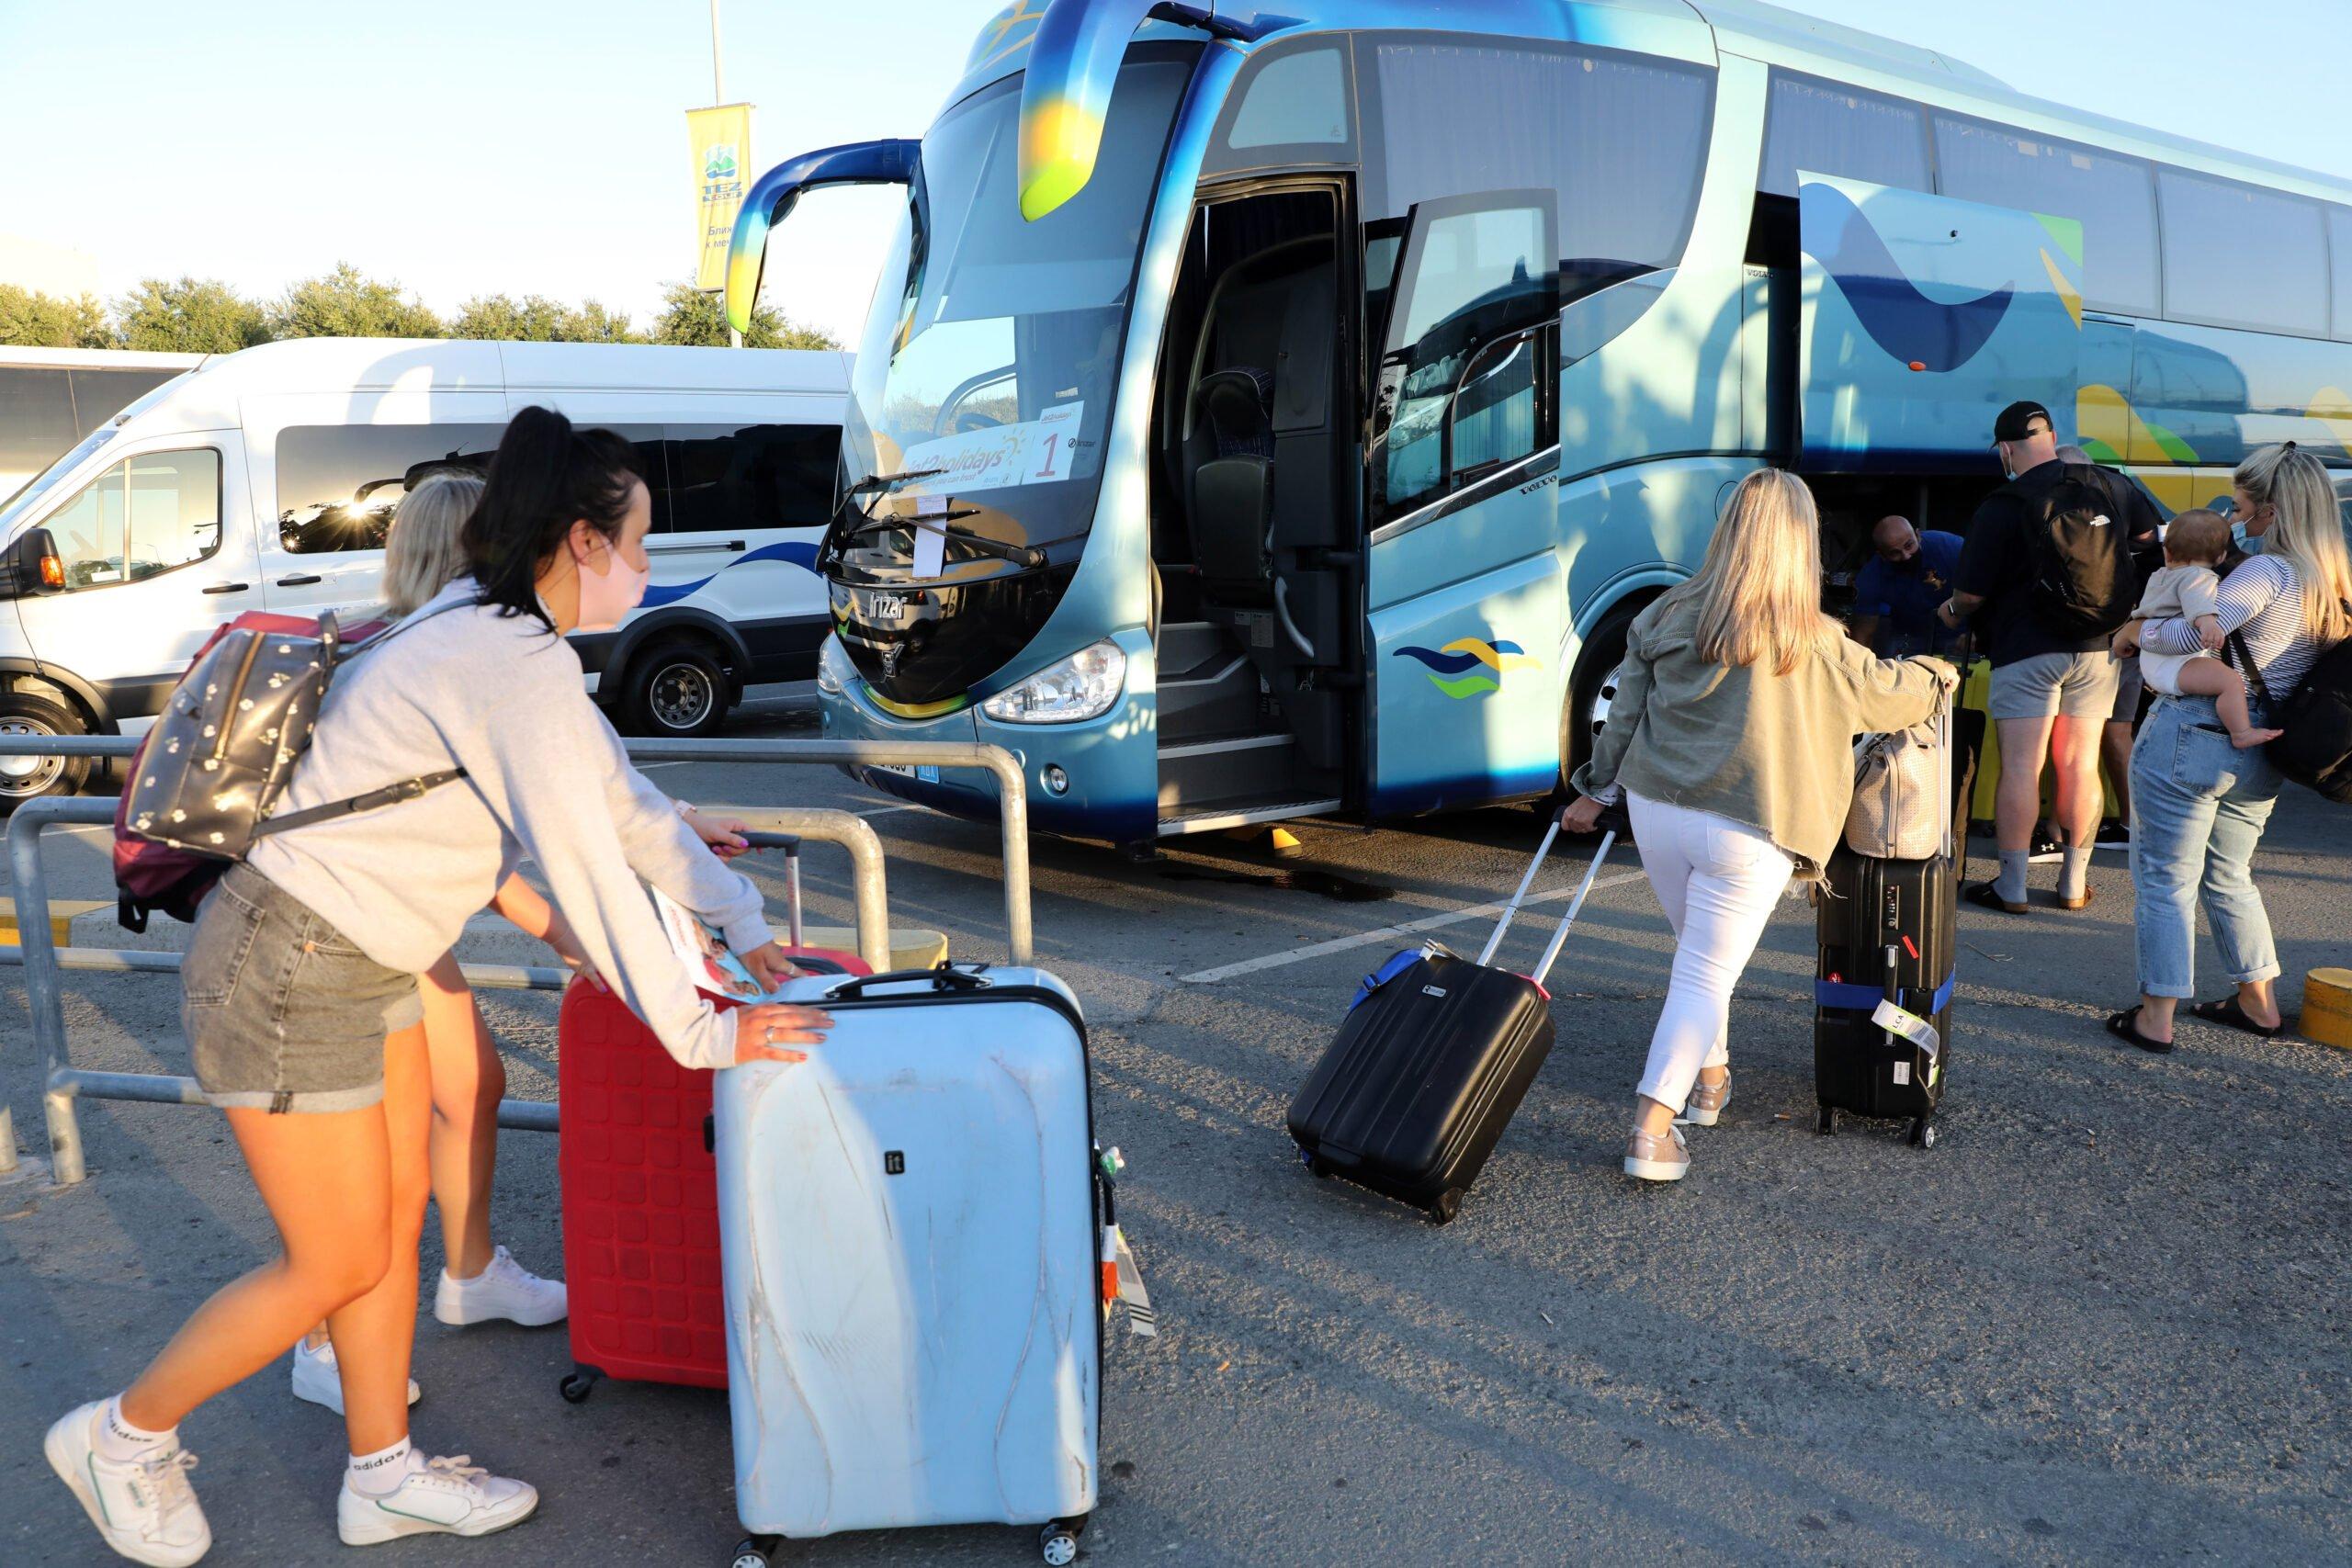 Coronavirus: Η Κύπρος εξαιρείται από την ασφαλή λίστα ταξιδιών στο Ηνωμένο Βασίλειο